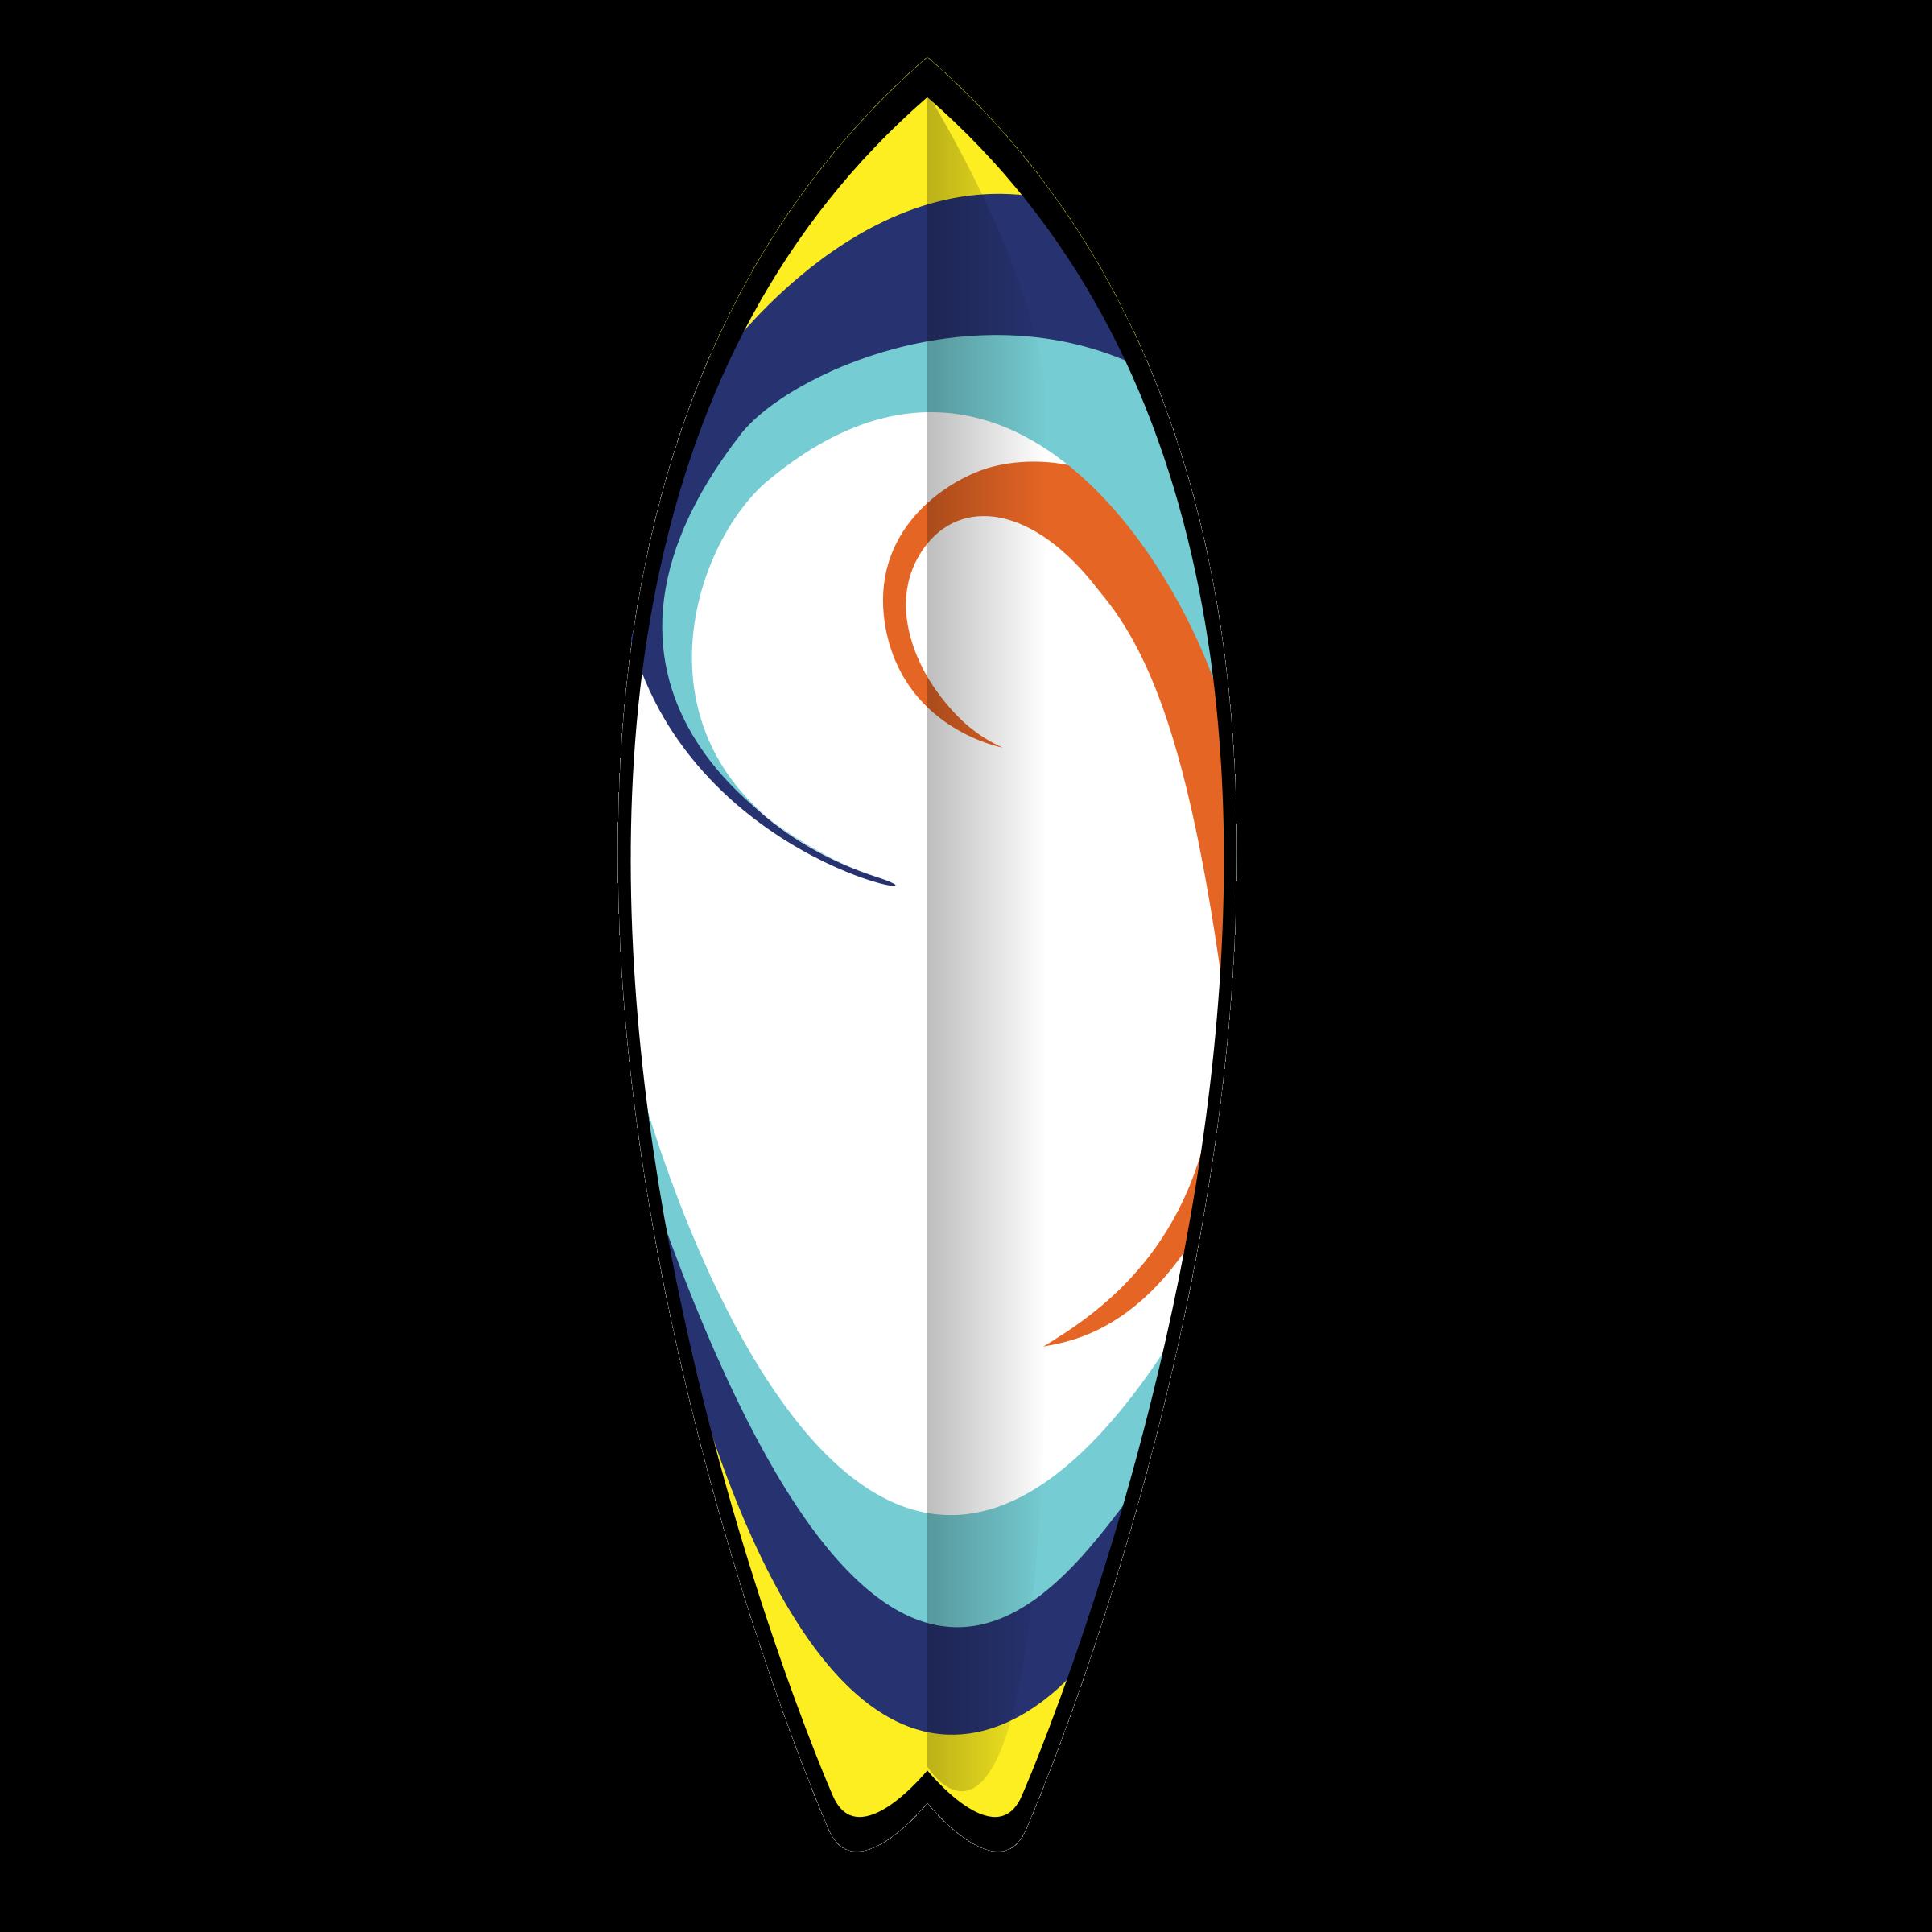 2400x2400 Surfboard Clip Art Free Clipart Panda